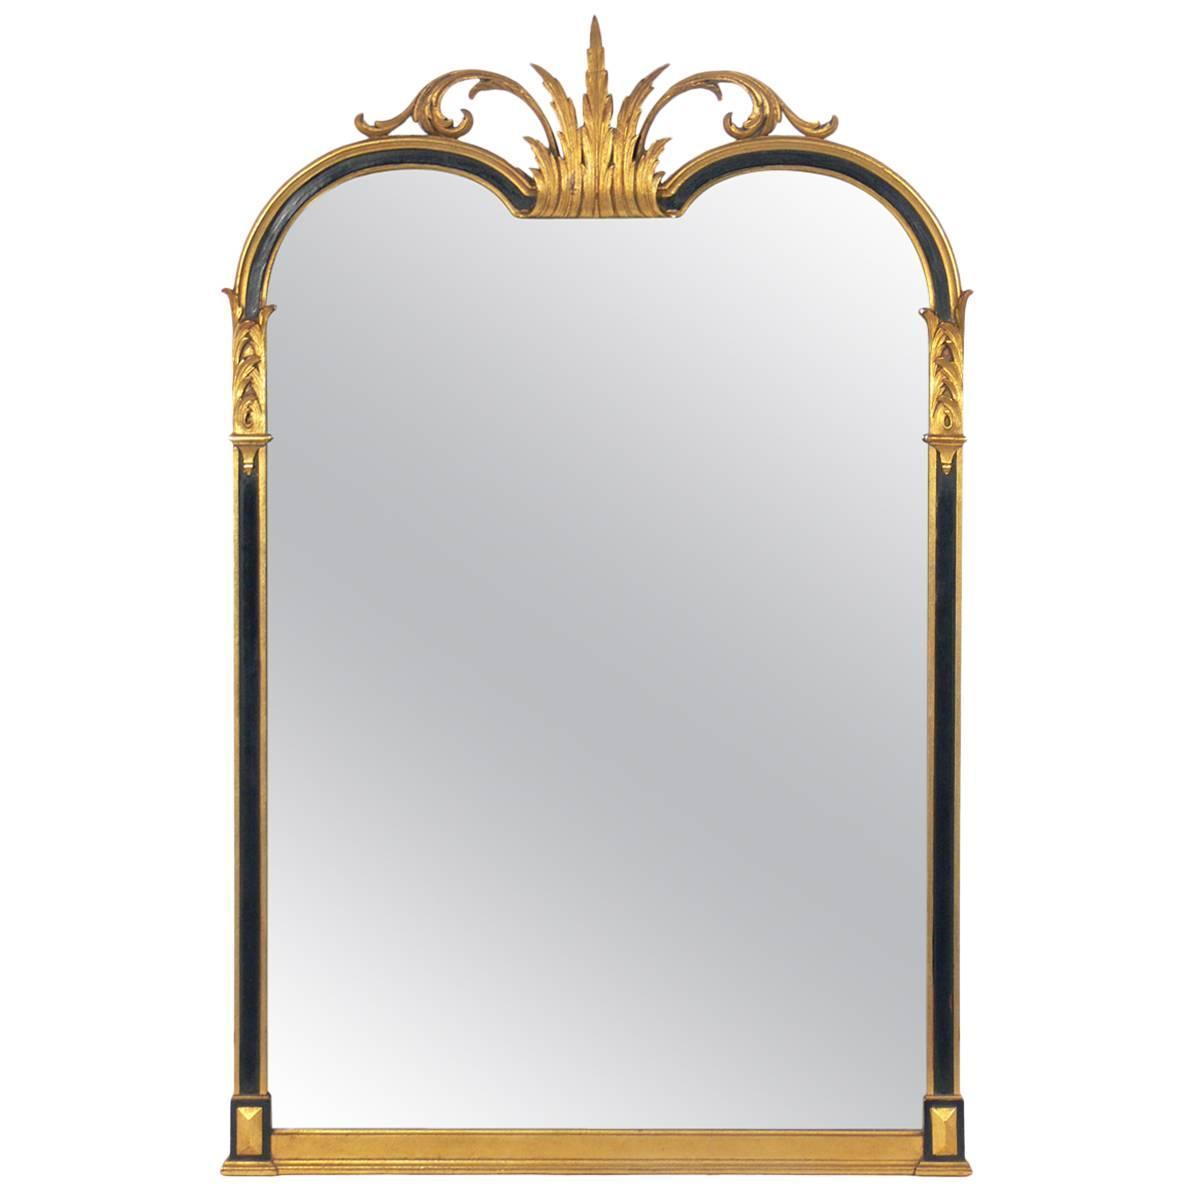 Elegant black and gold italian mirror circa 1940s for for Elegant mirrors